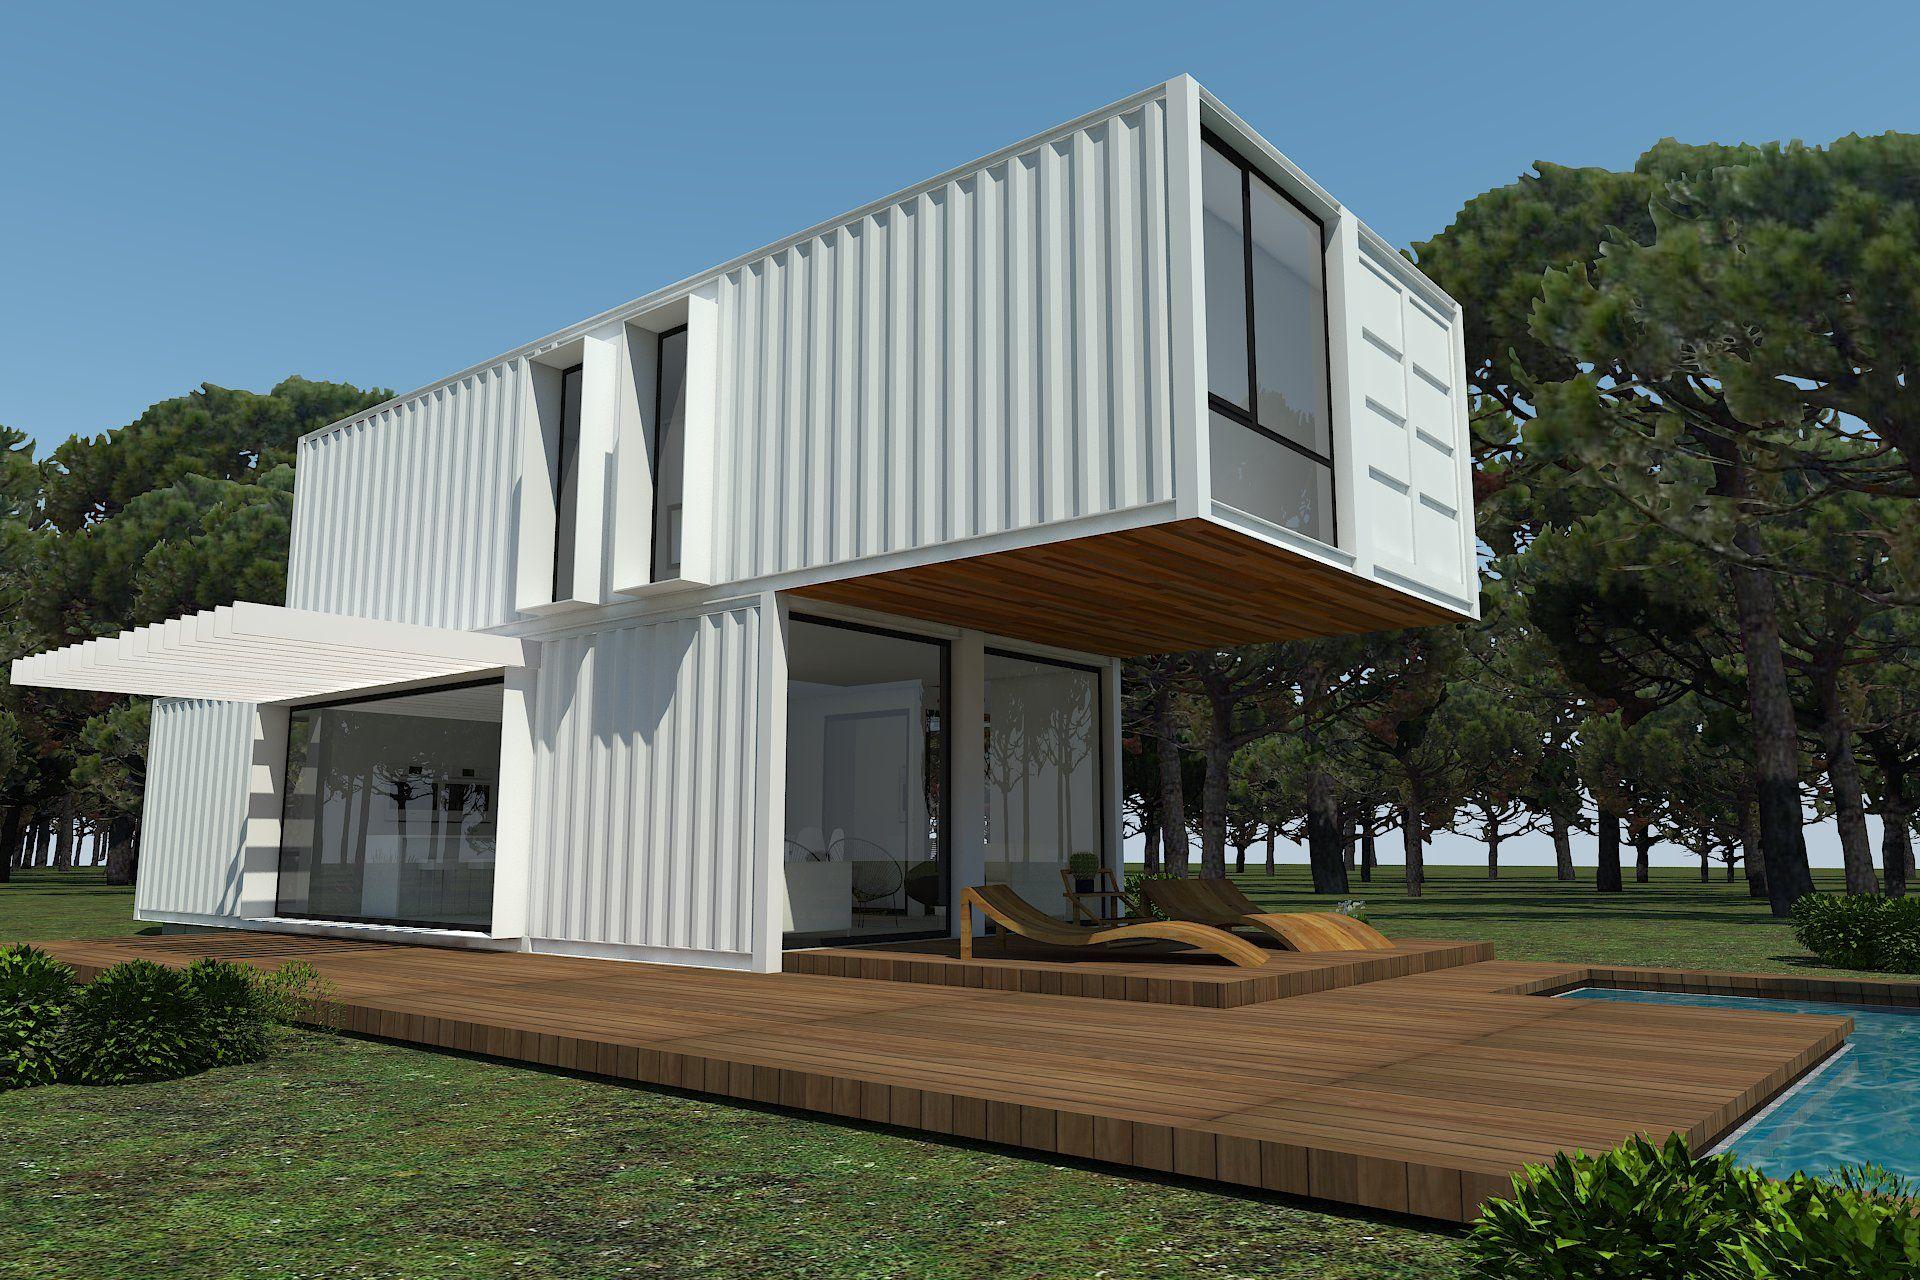 H kub casas prefabricadas en contenedores mar timos mi - Casas de contenedores maritimos ...